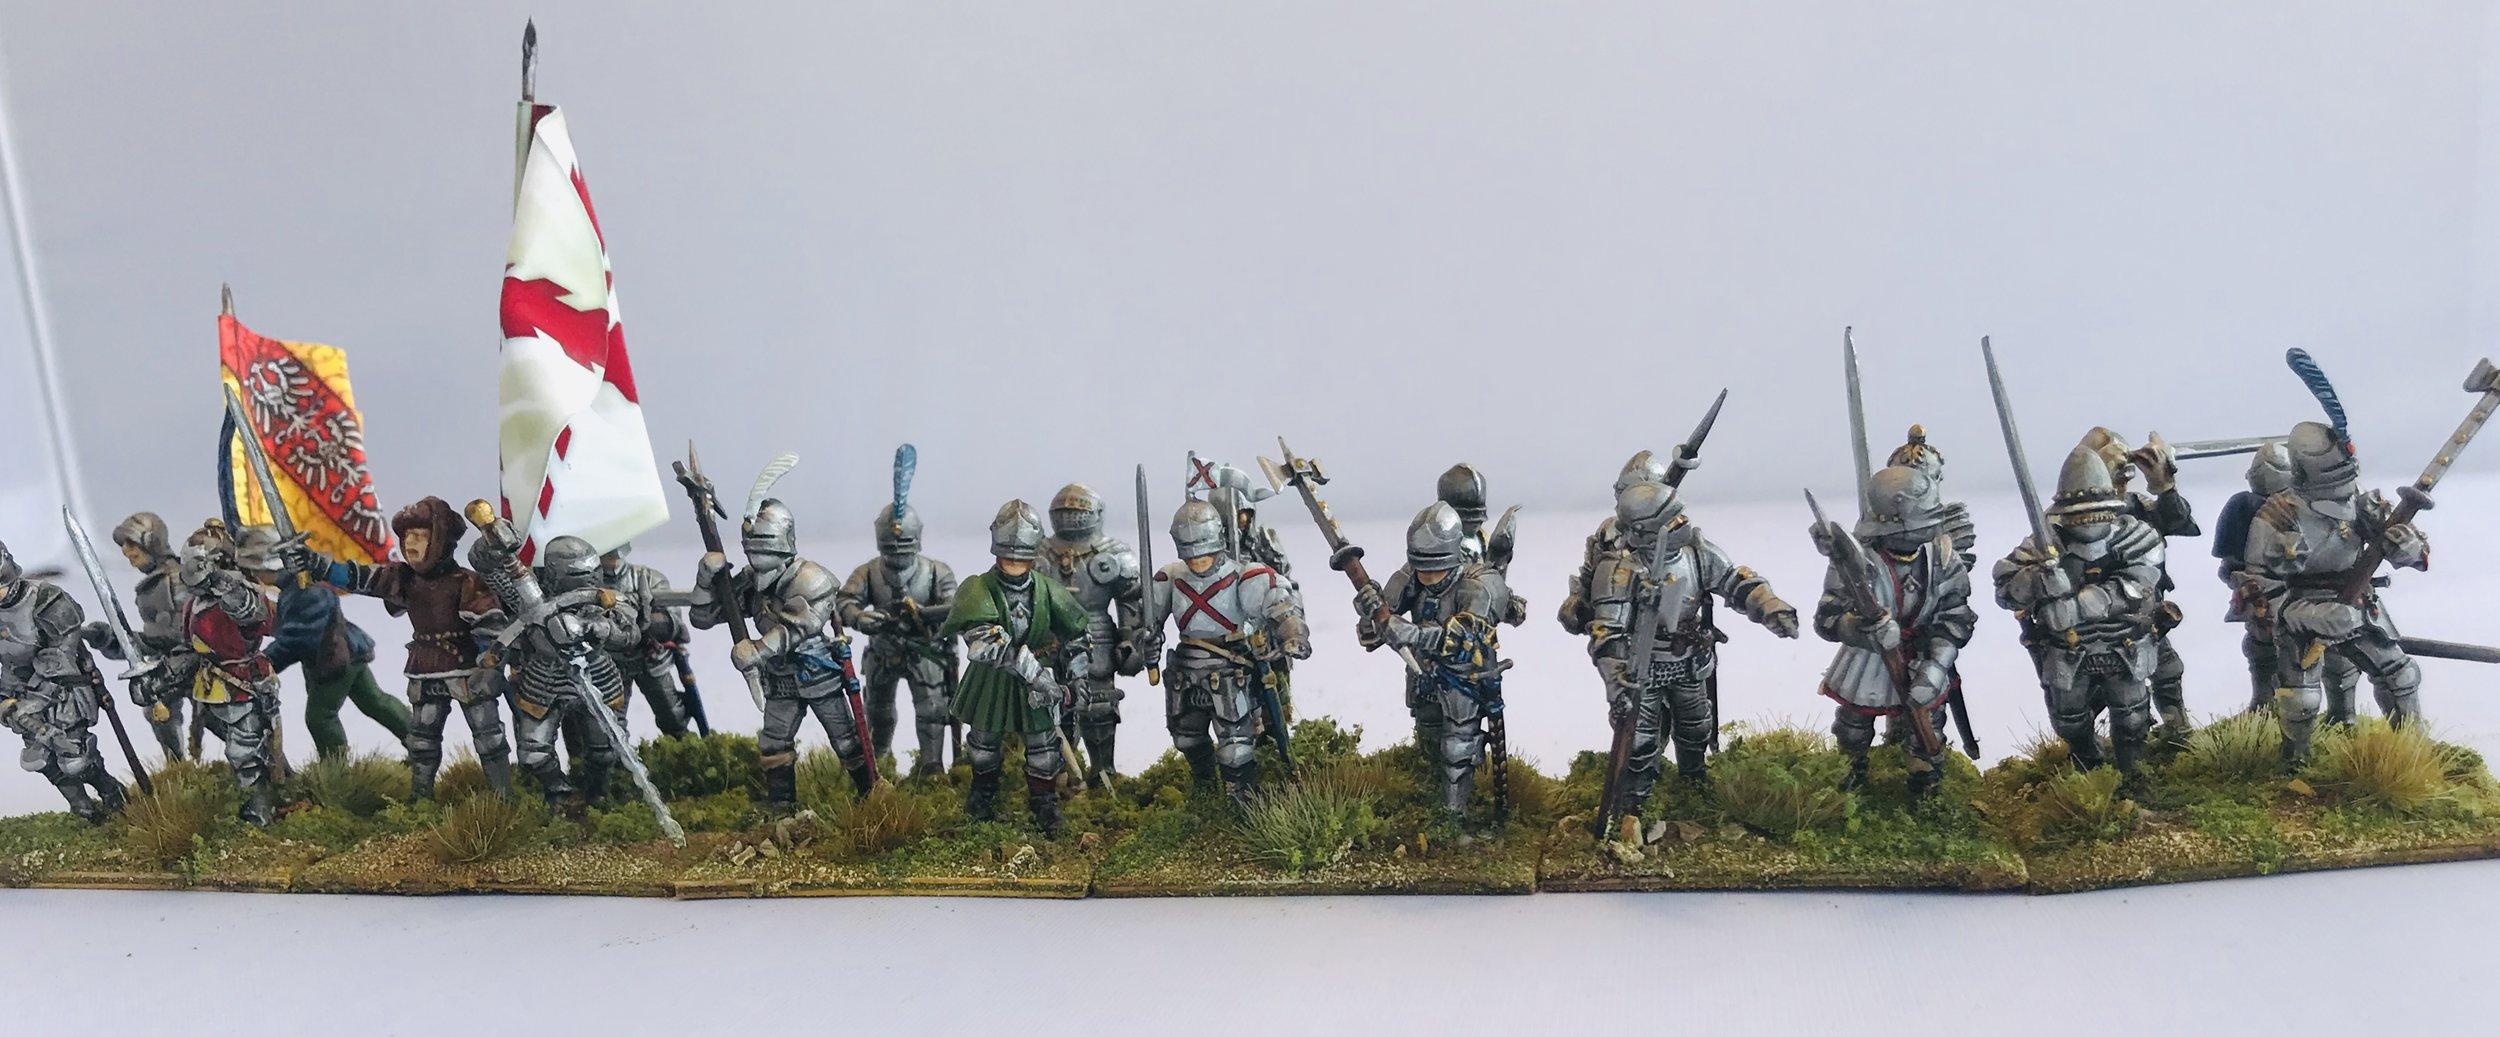 Chris Cornwell's Dismounted Knights